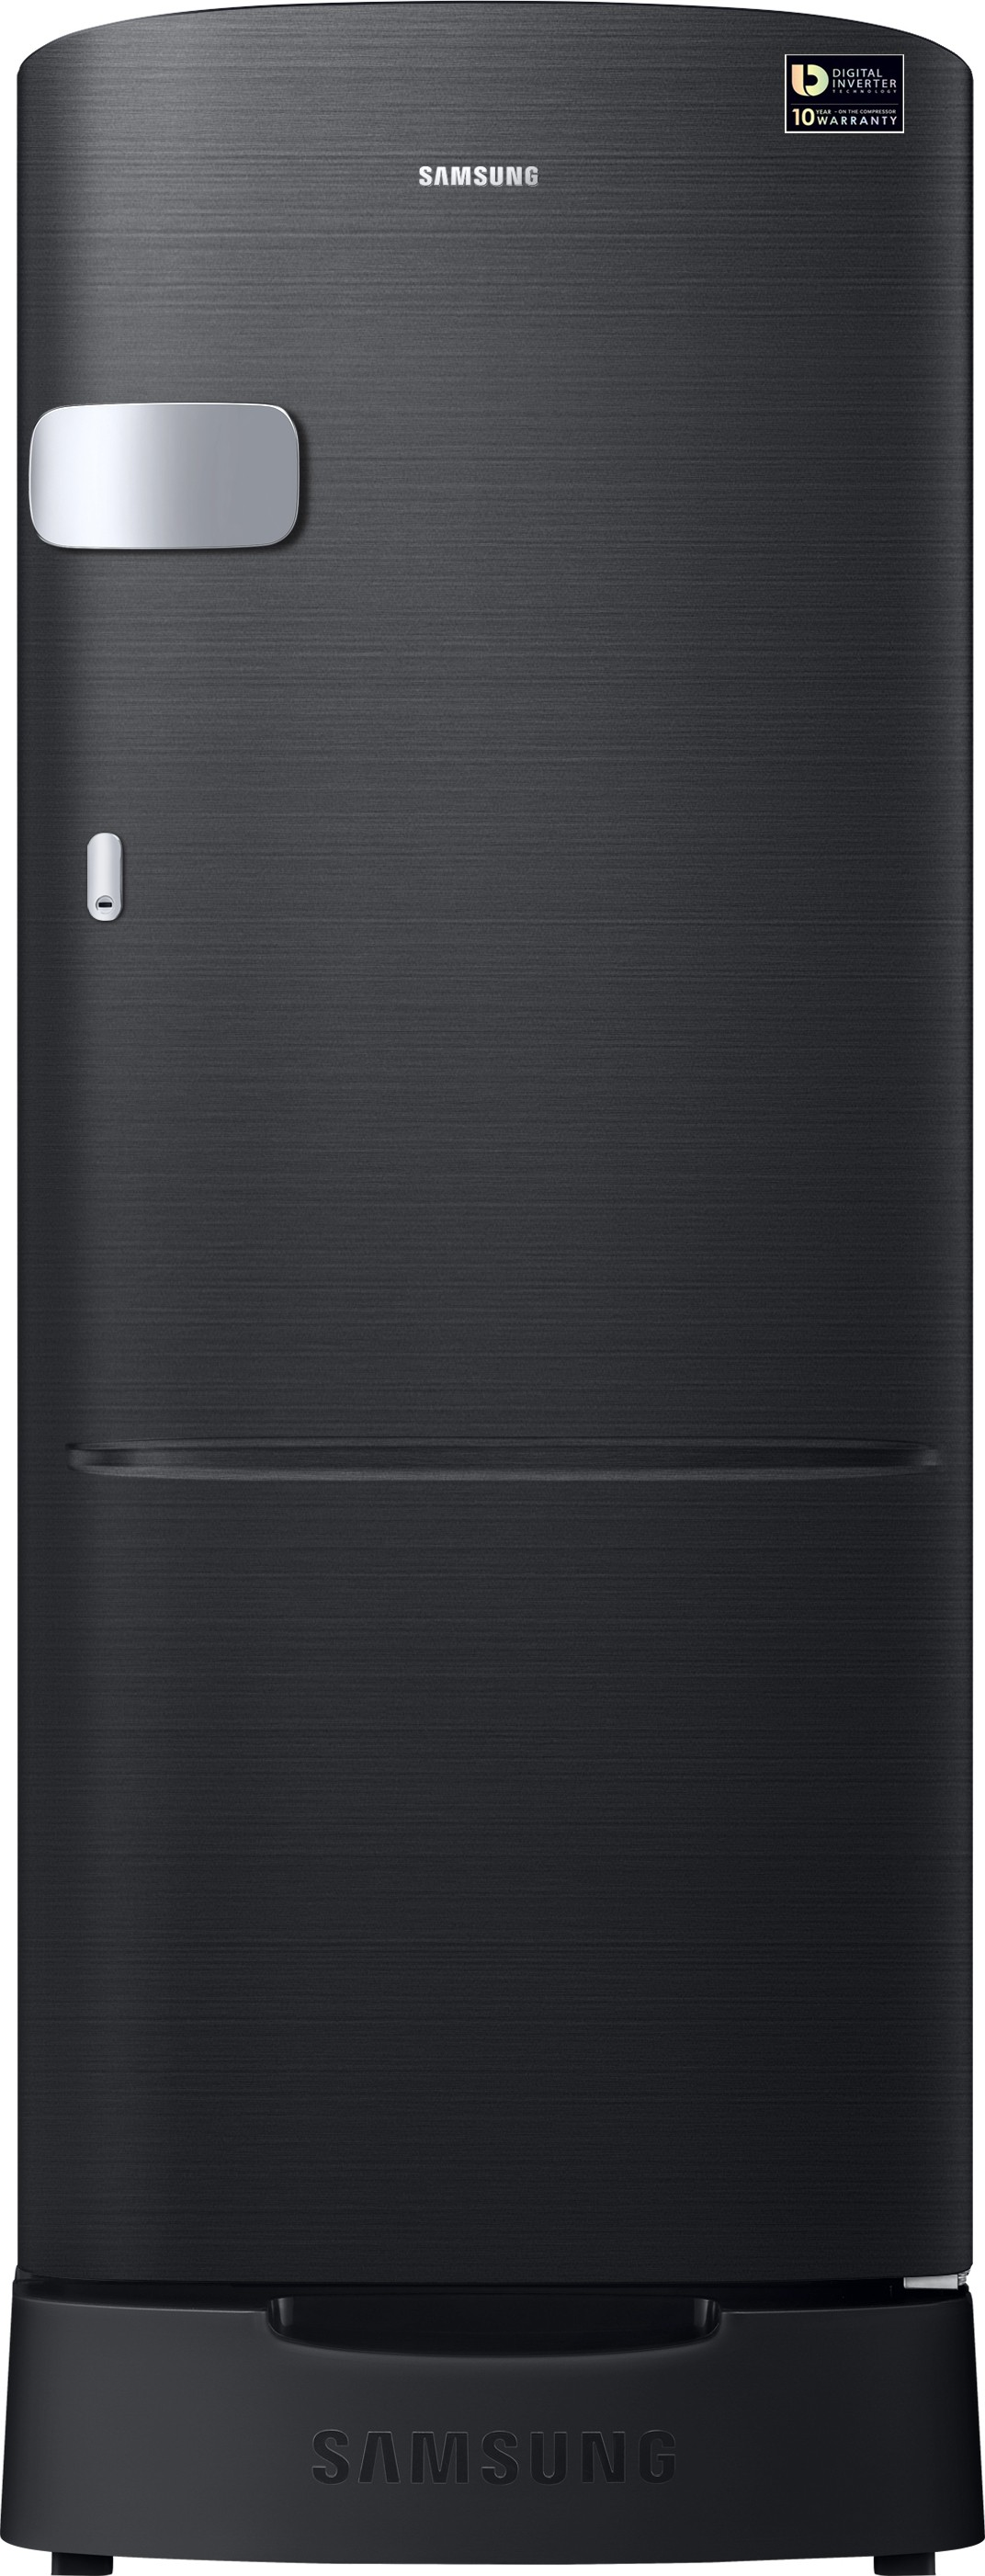 SAMSUNG 192 L Direct Cool Single Door Refrigerator(RR20M2Z2XBS/NL,RR20M1Z2XBS/HL, Black Mirror VCM, 2017)   Refrigerator  (Samsung)